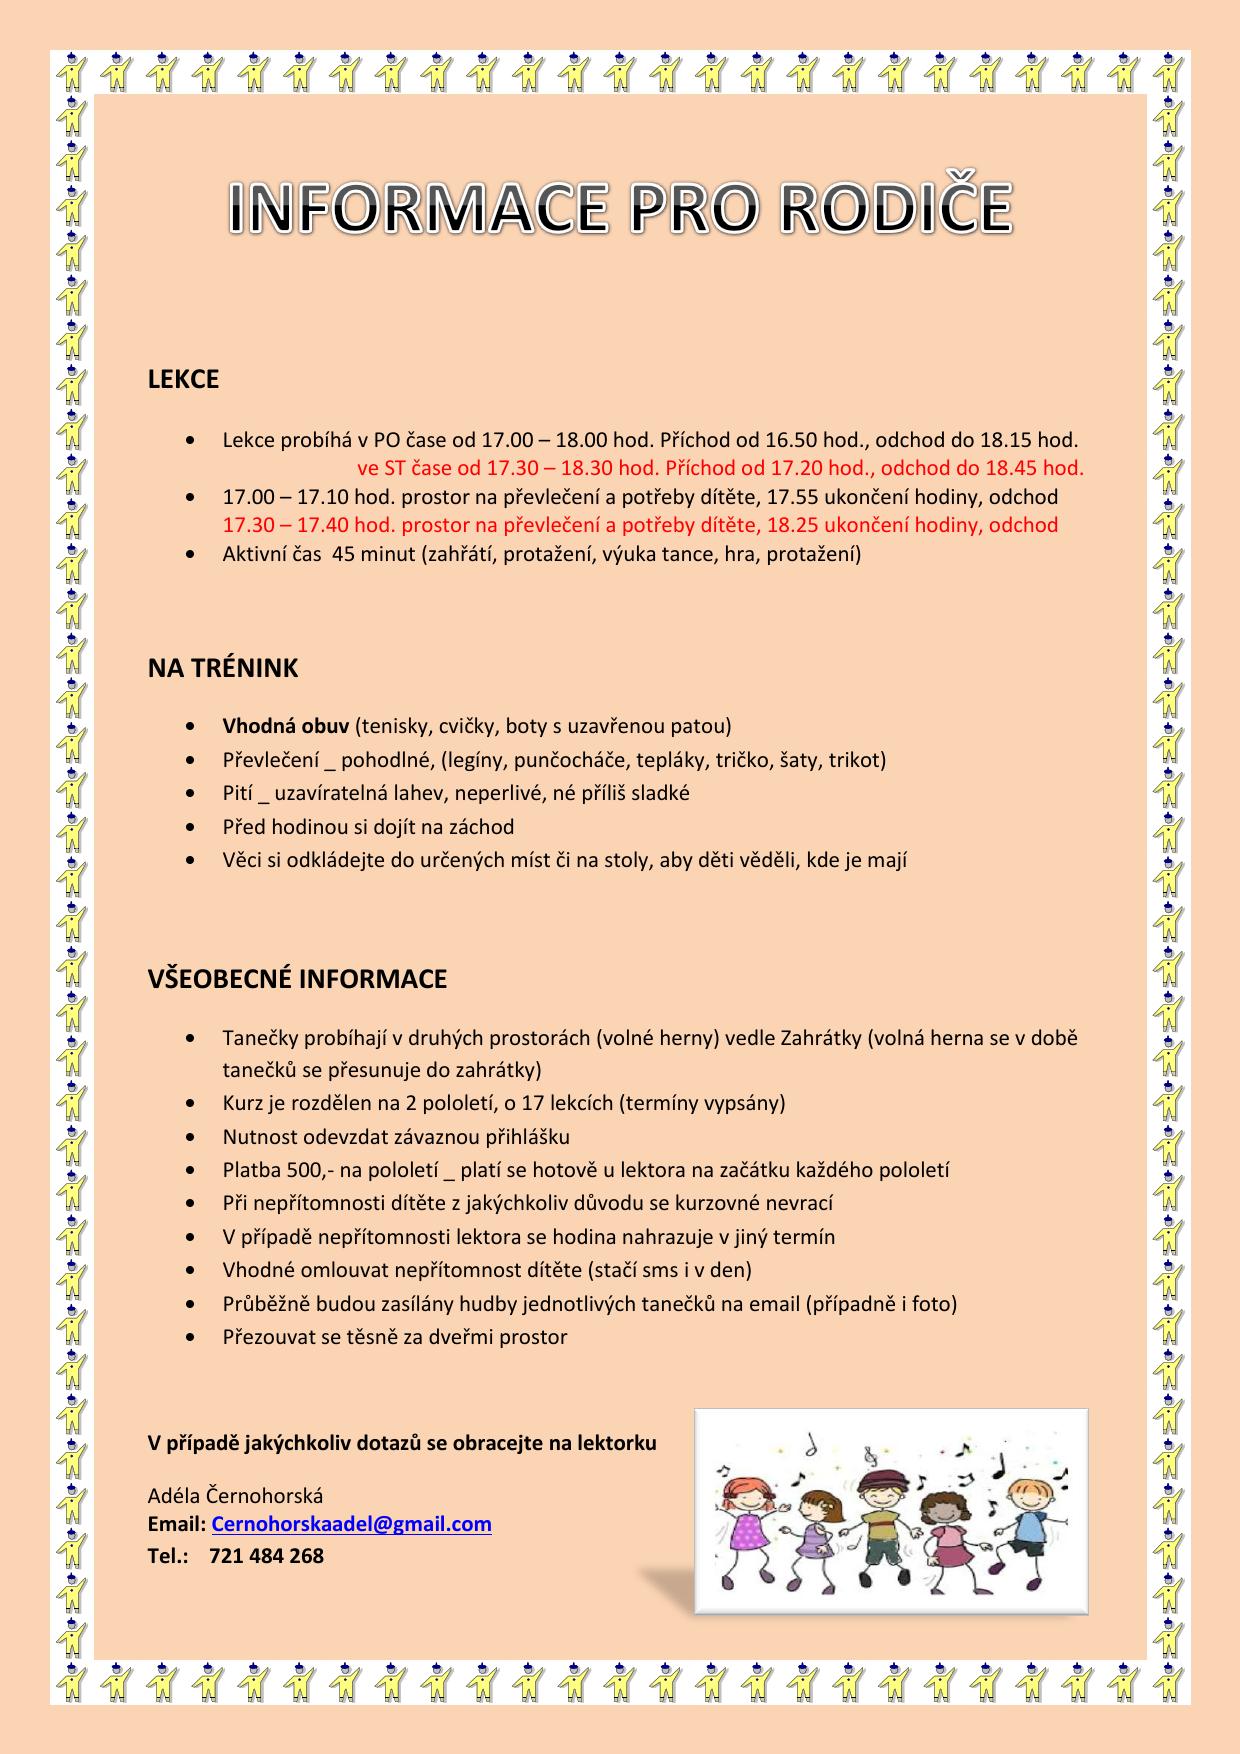 informace.pdf-000001